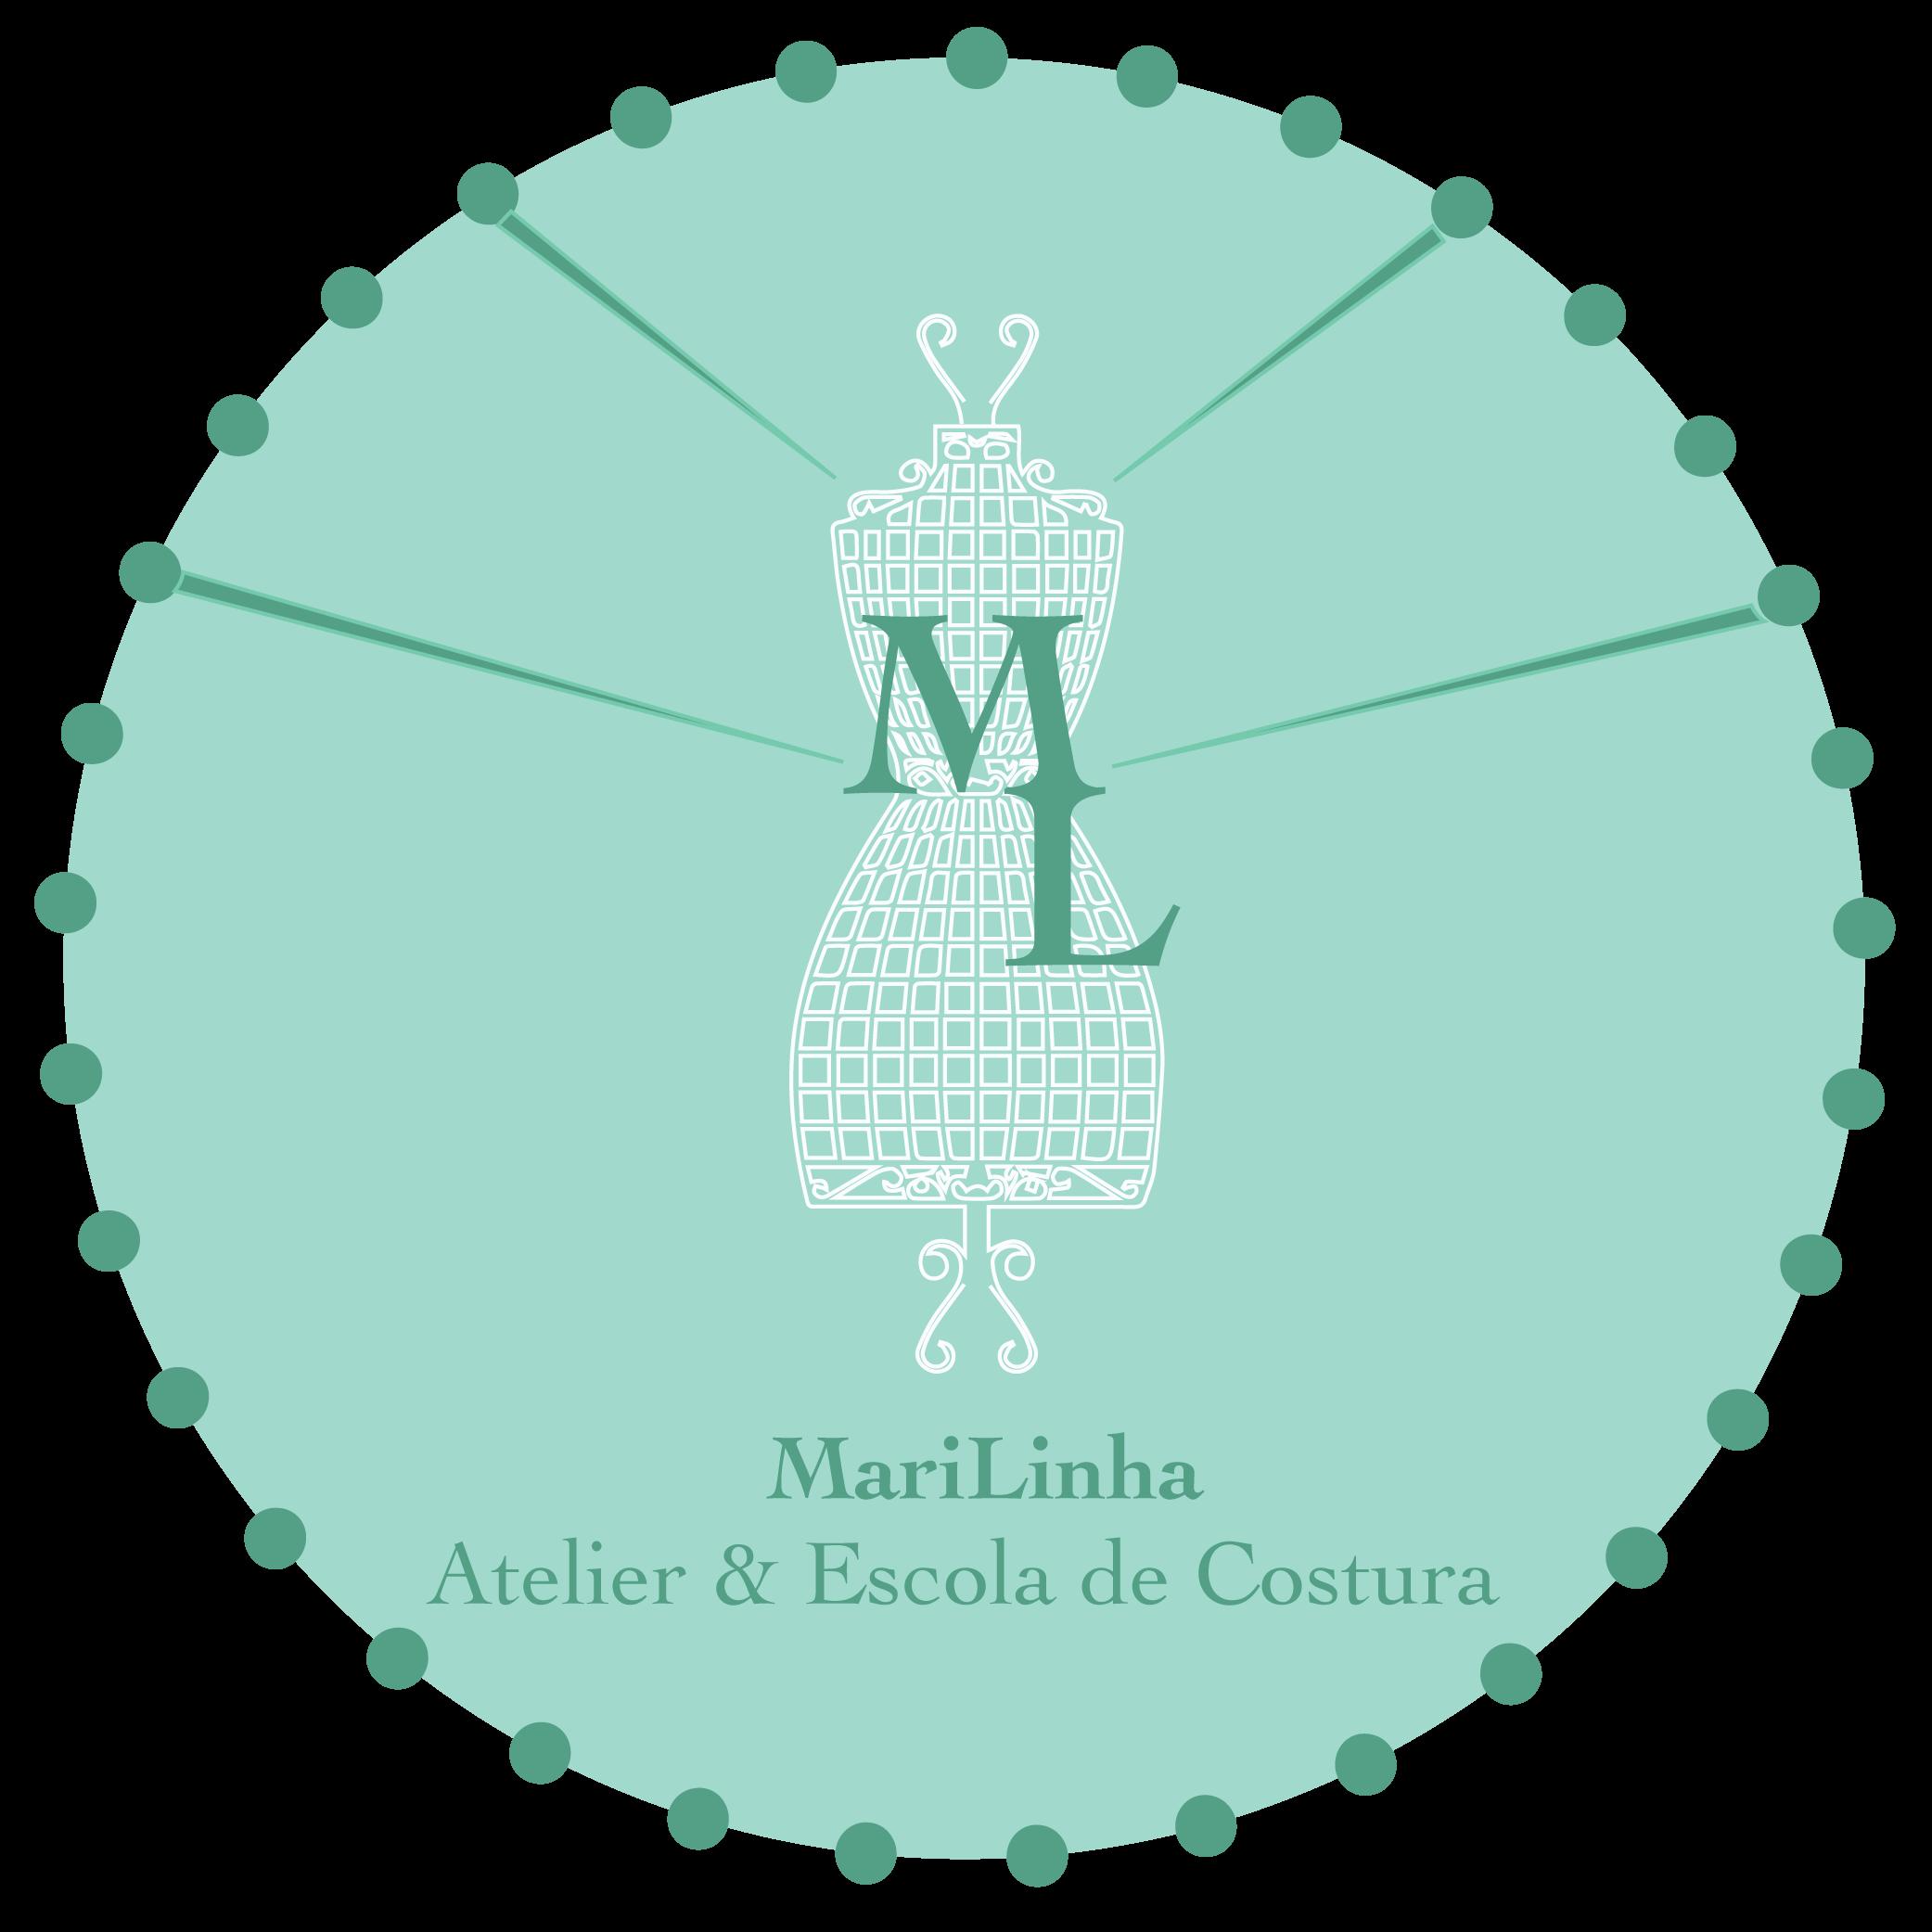 Marilinha